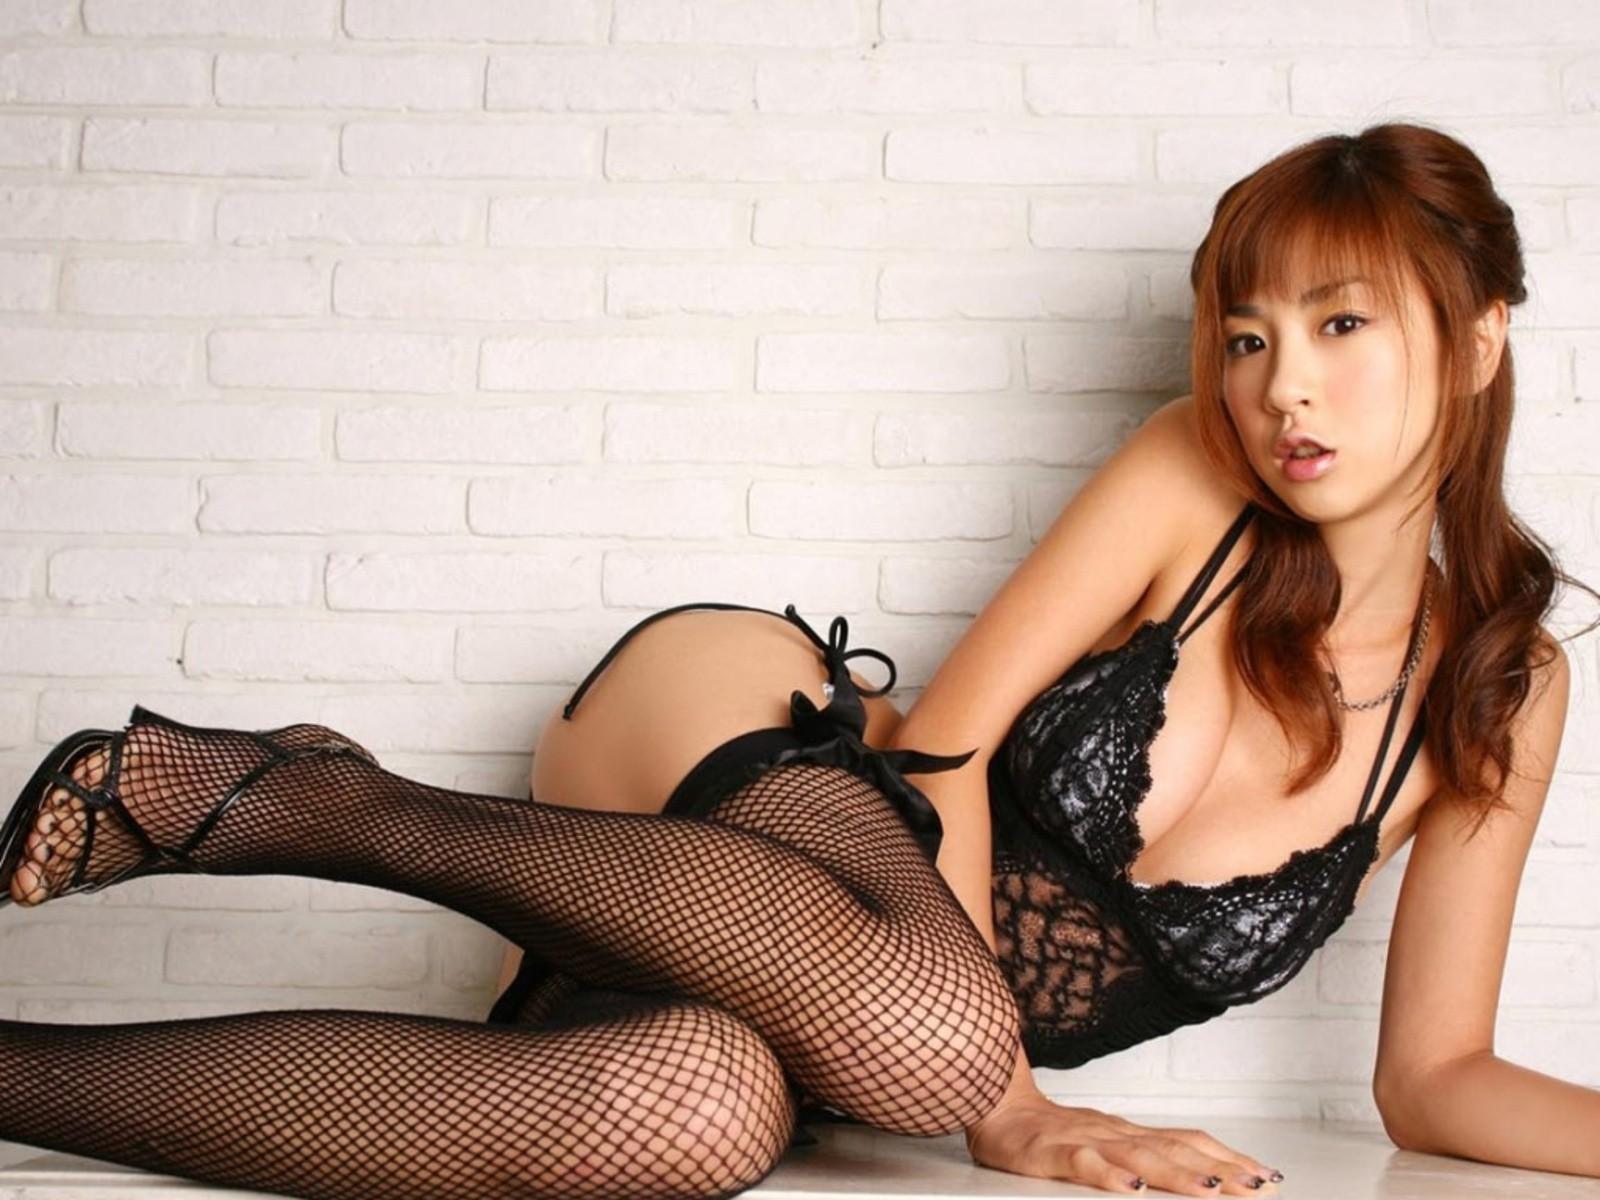 Aki Hoshino wallpaper : women, model, long hair, brunette, looking at